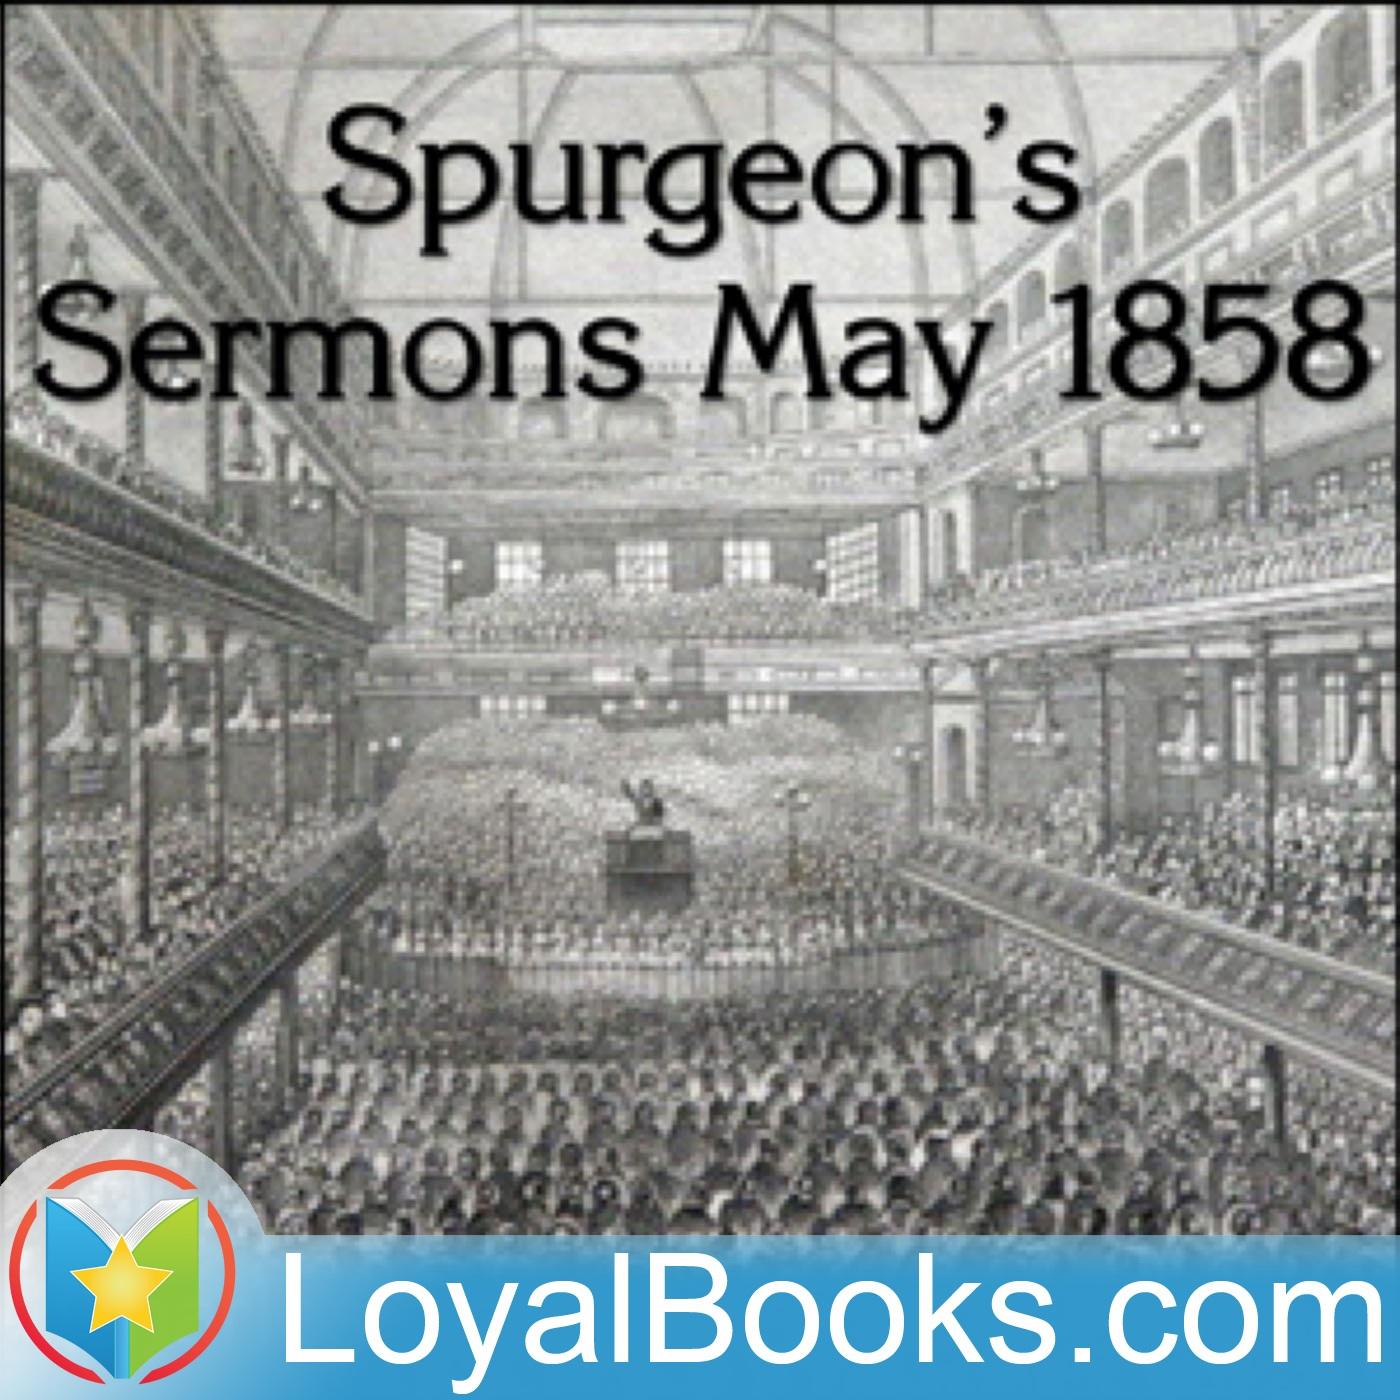 <![CDATA[Spurgeon's Sermons May 1858 by Charles Spurgeon]]>